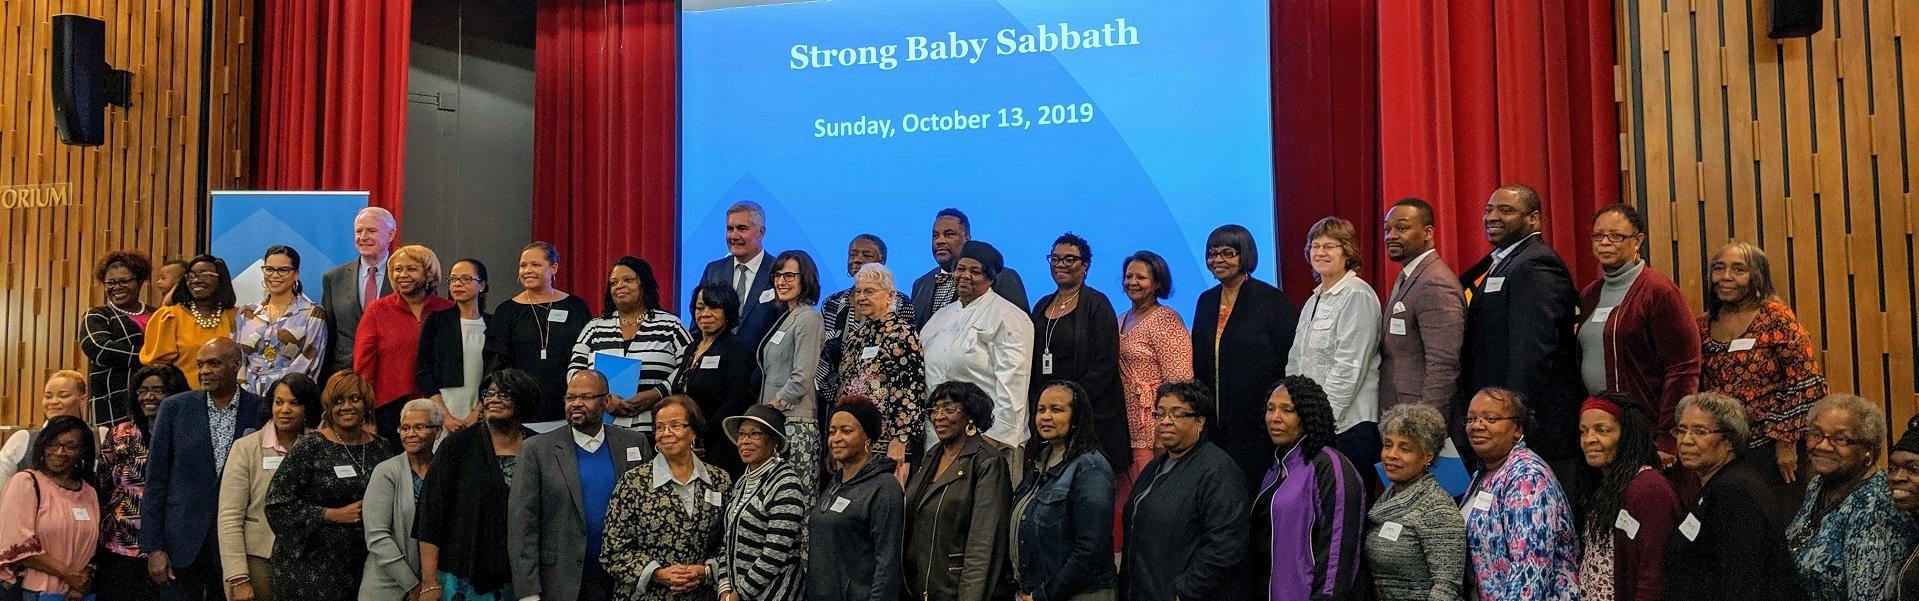 Strong Baby Sabbath